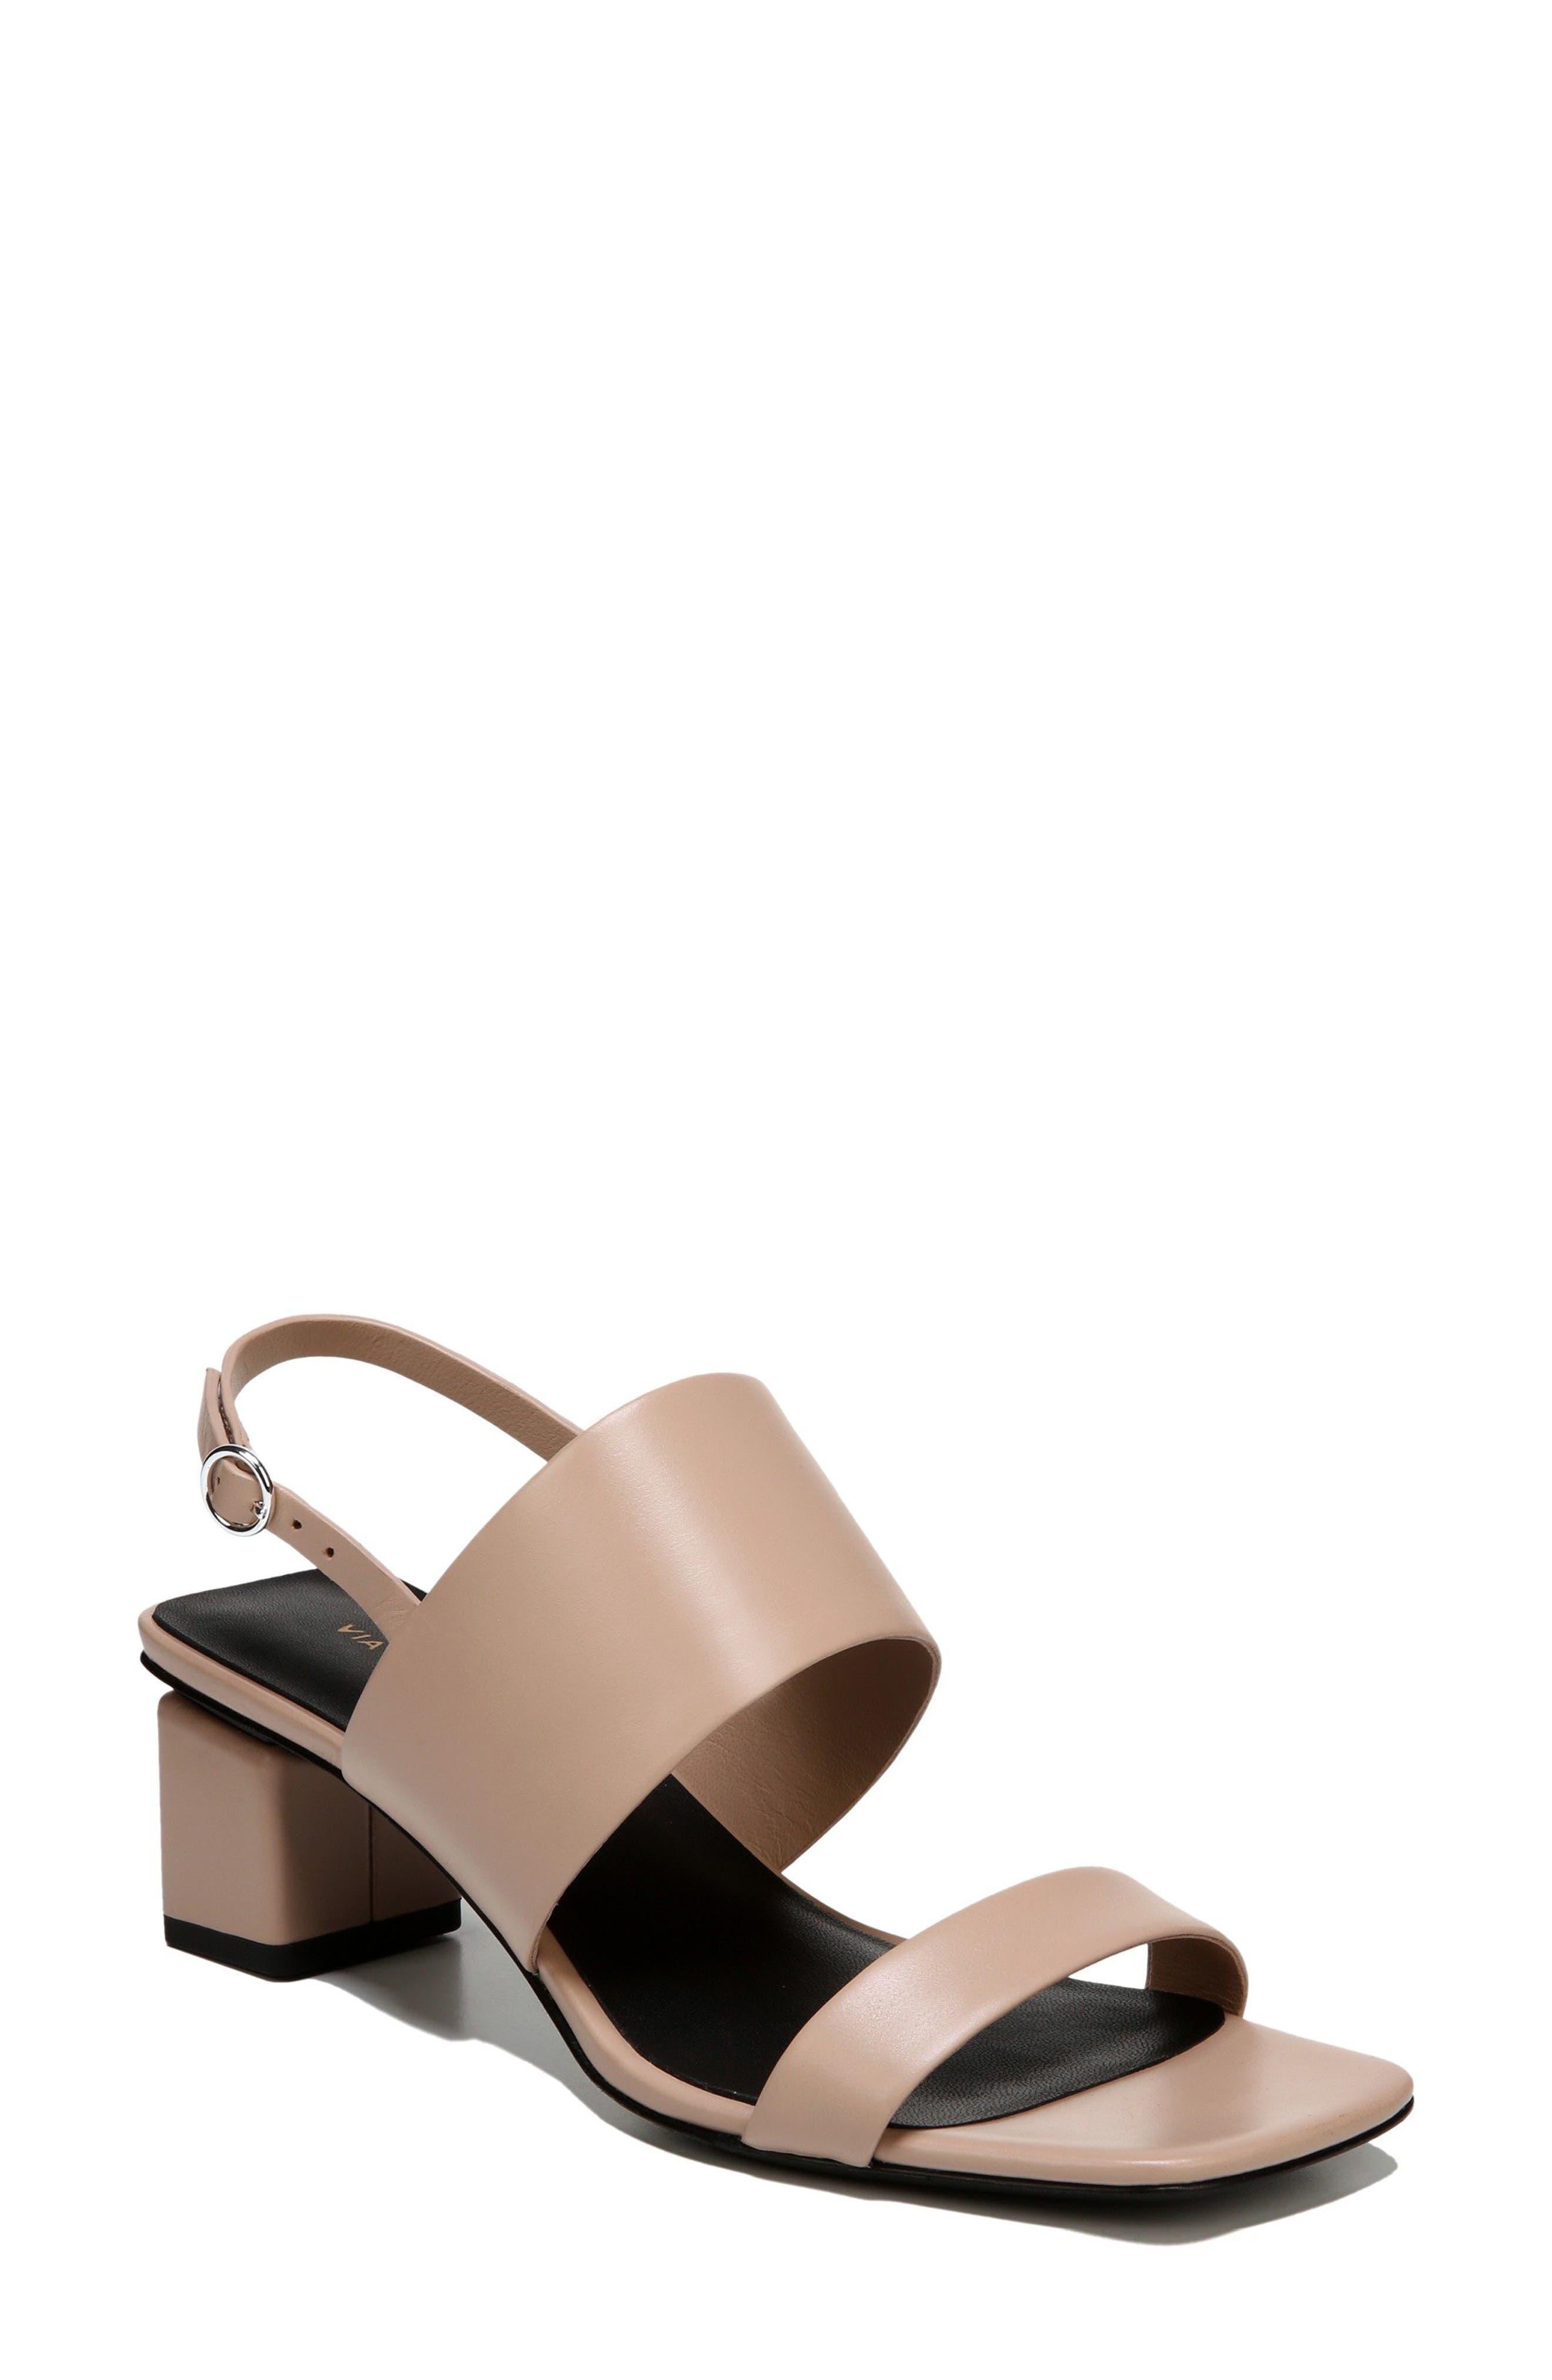 Forte Block Heel Sandal,                             Main thumbnail 1, color,                             Sand Patent